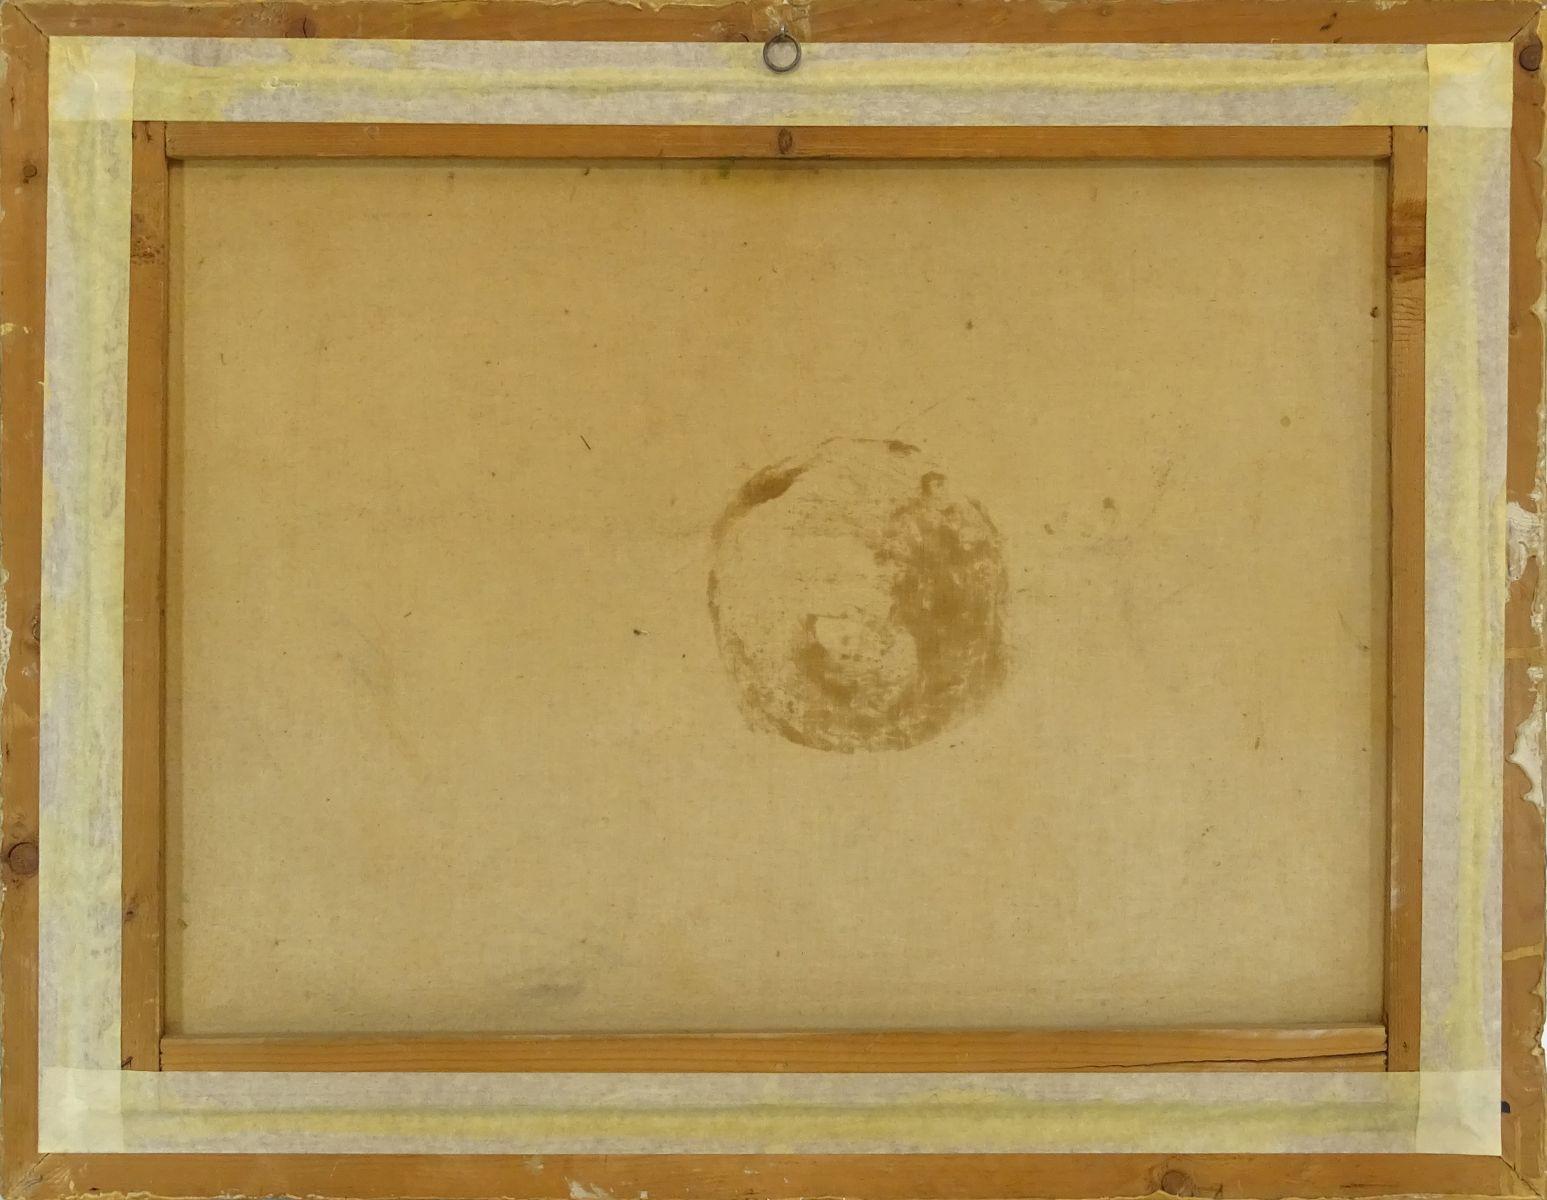 DSC03336.JPG (1547×1200)